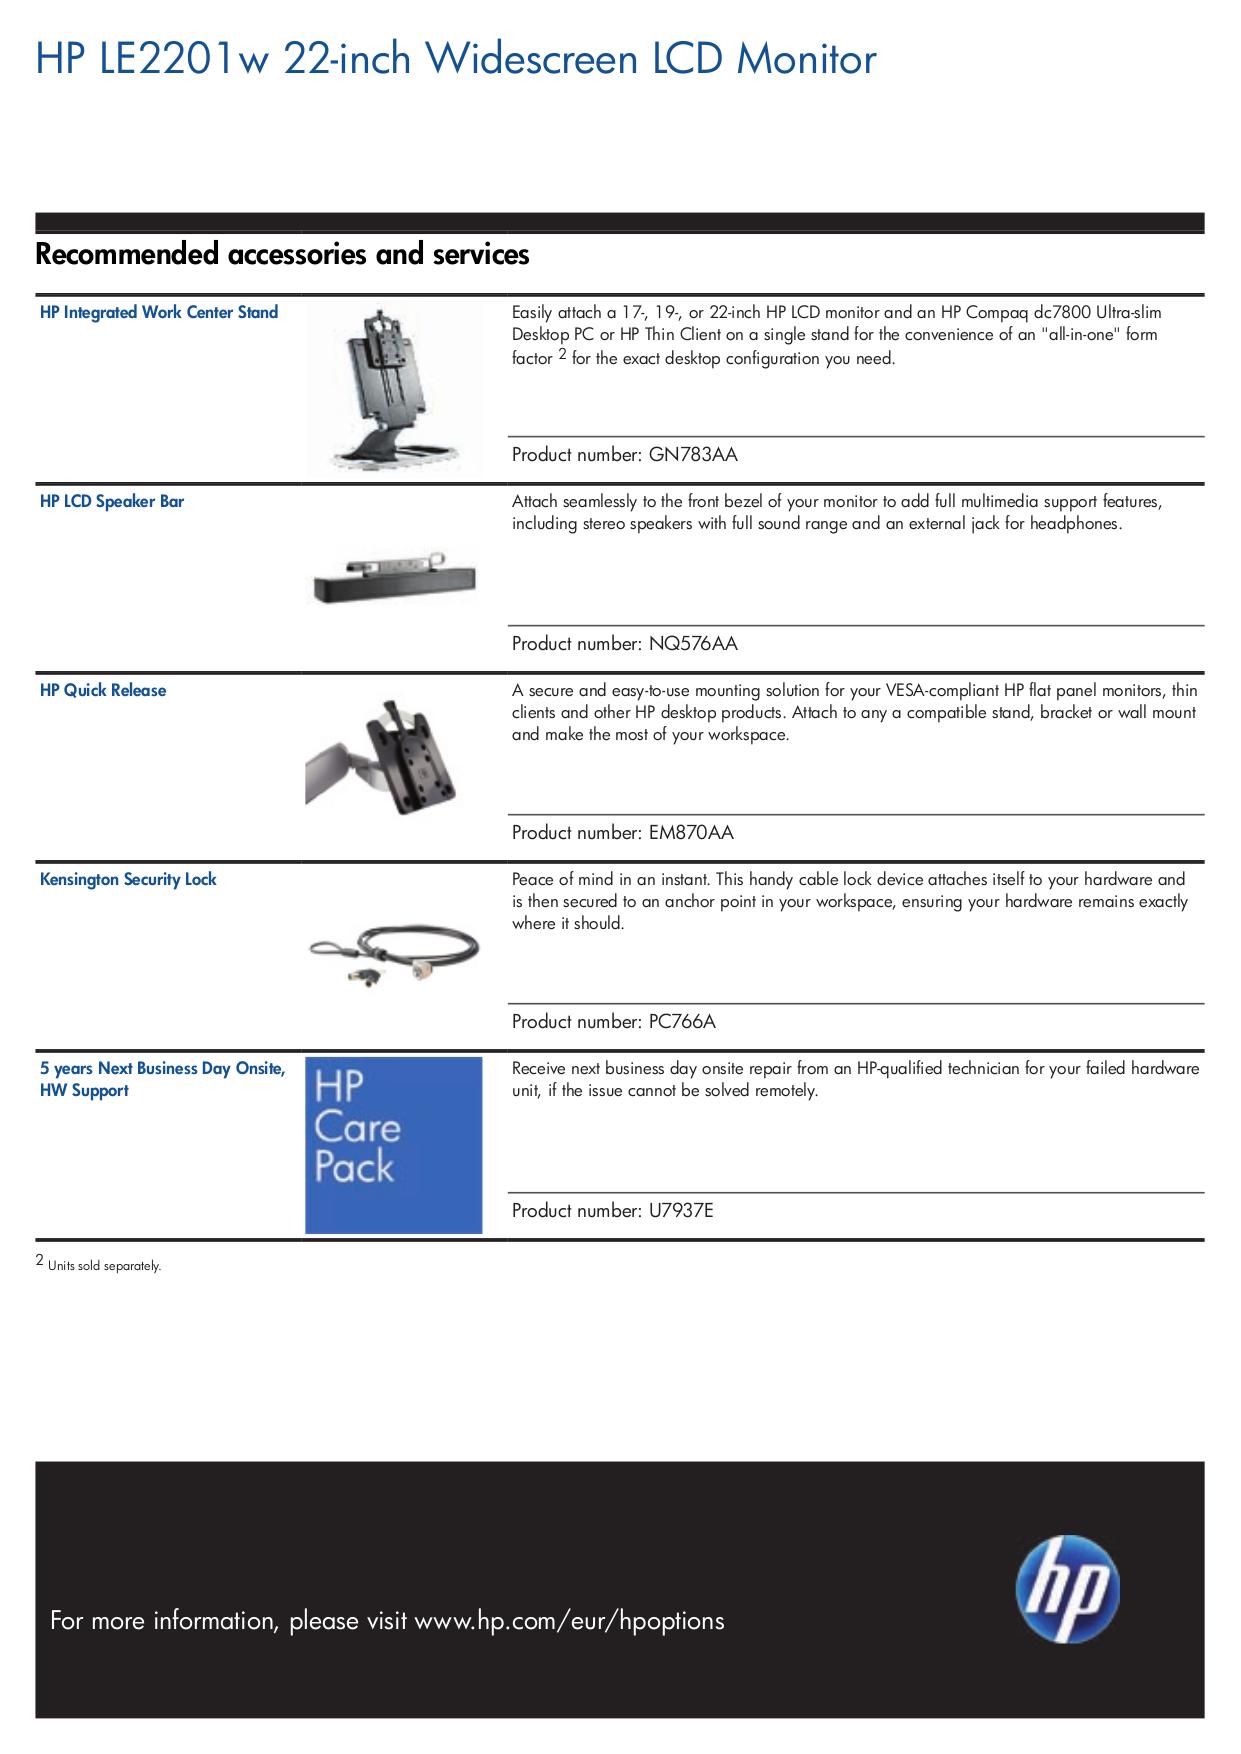 PDF manual for HP Monitor LE2201W